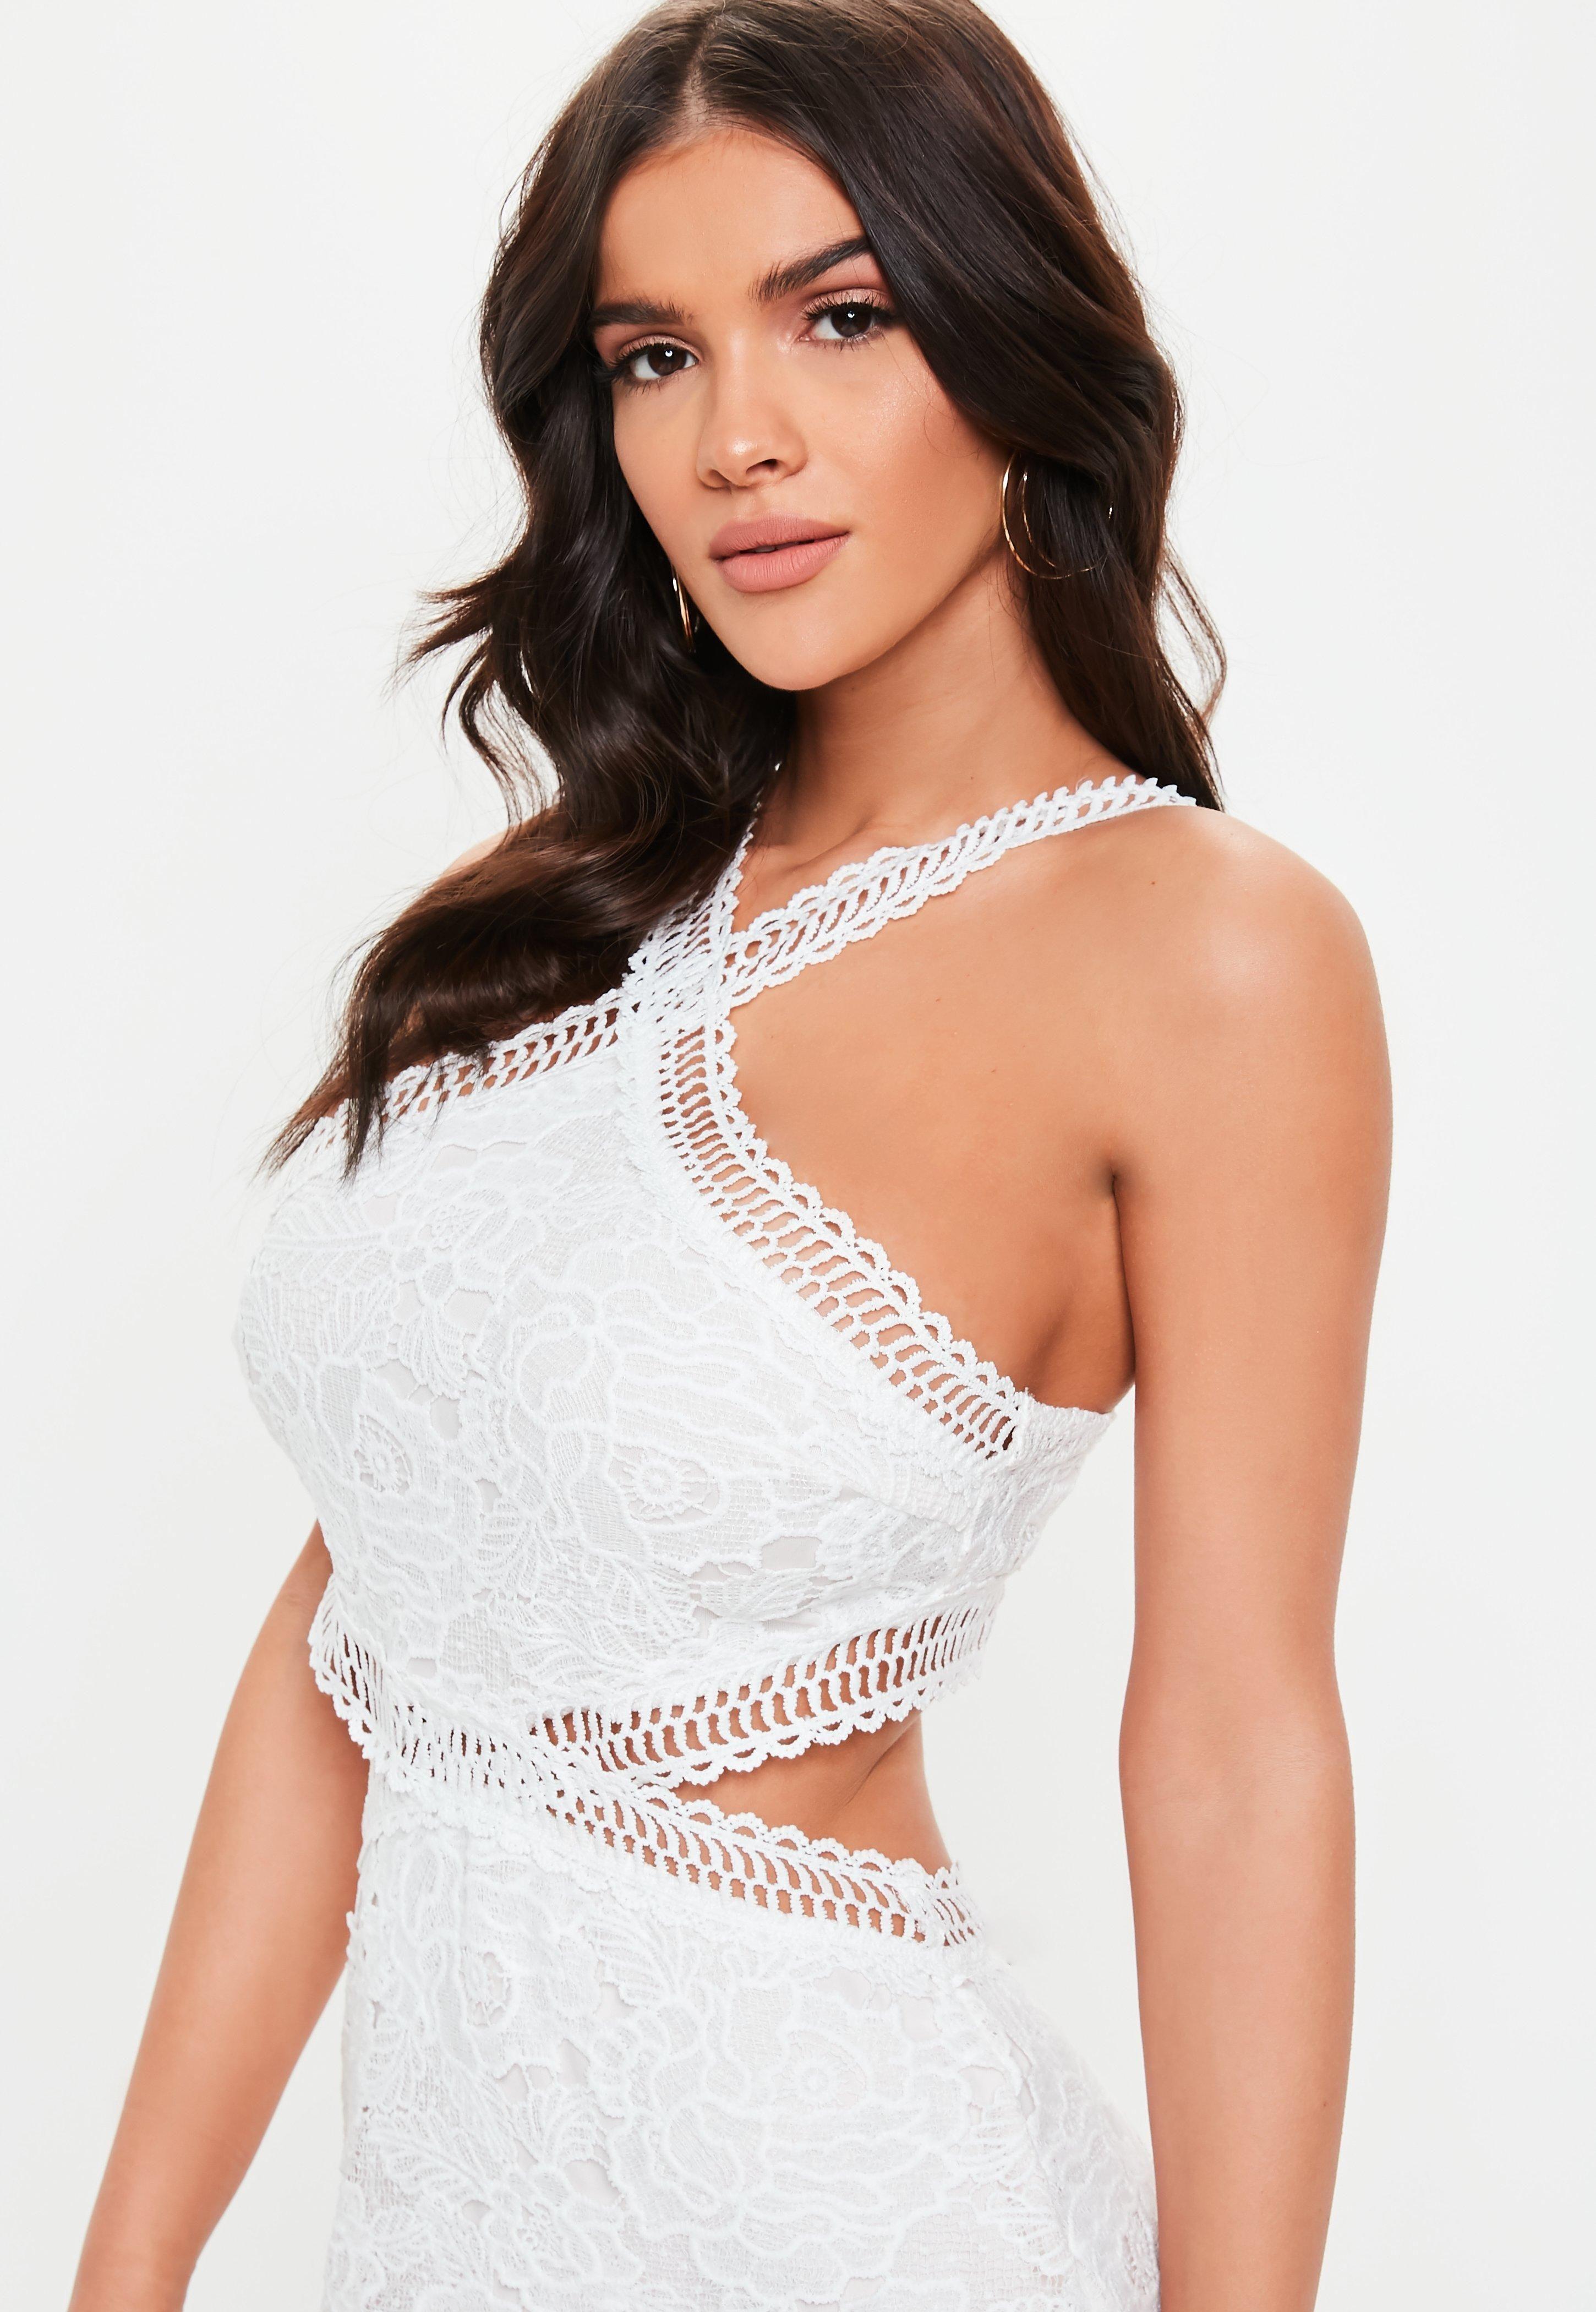 81f10b931793 White Cut Out Lace Trim Frill Hem Mini Dress #Sponsored #Lace, #spon, #Trim,  #White